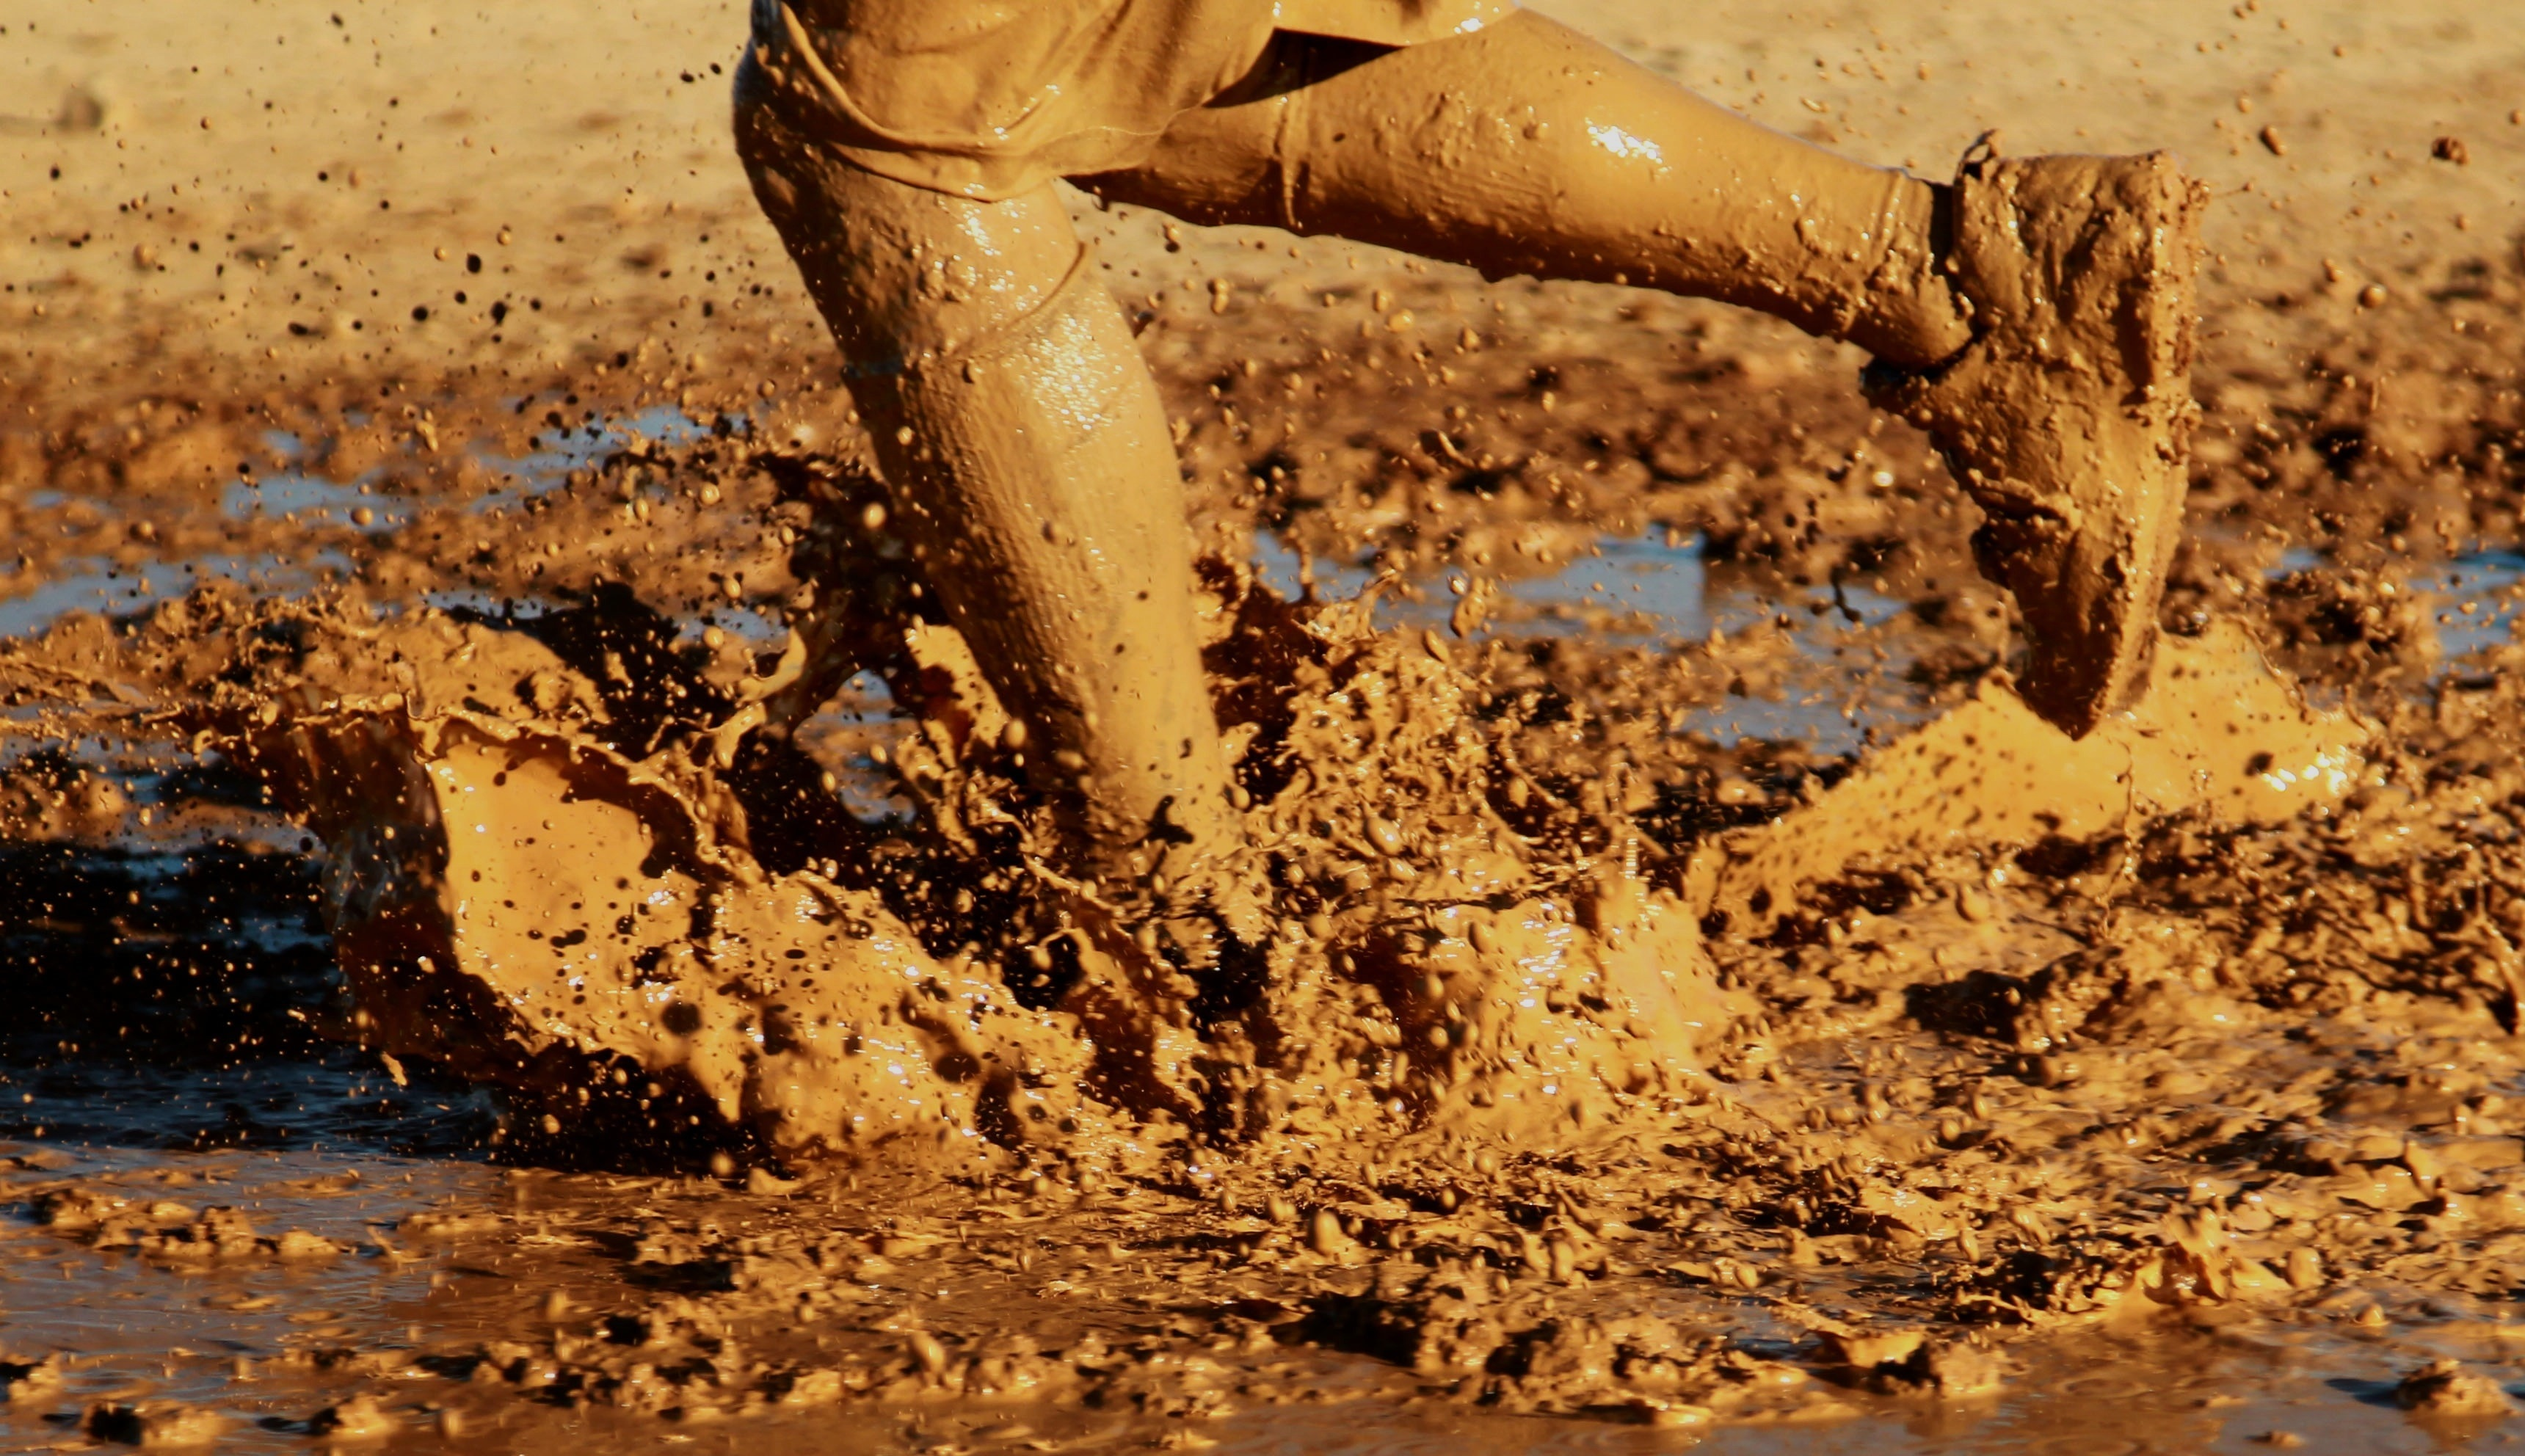 Running Water Outside Mud Muddy mud no people image 3440x1984